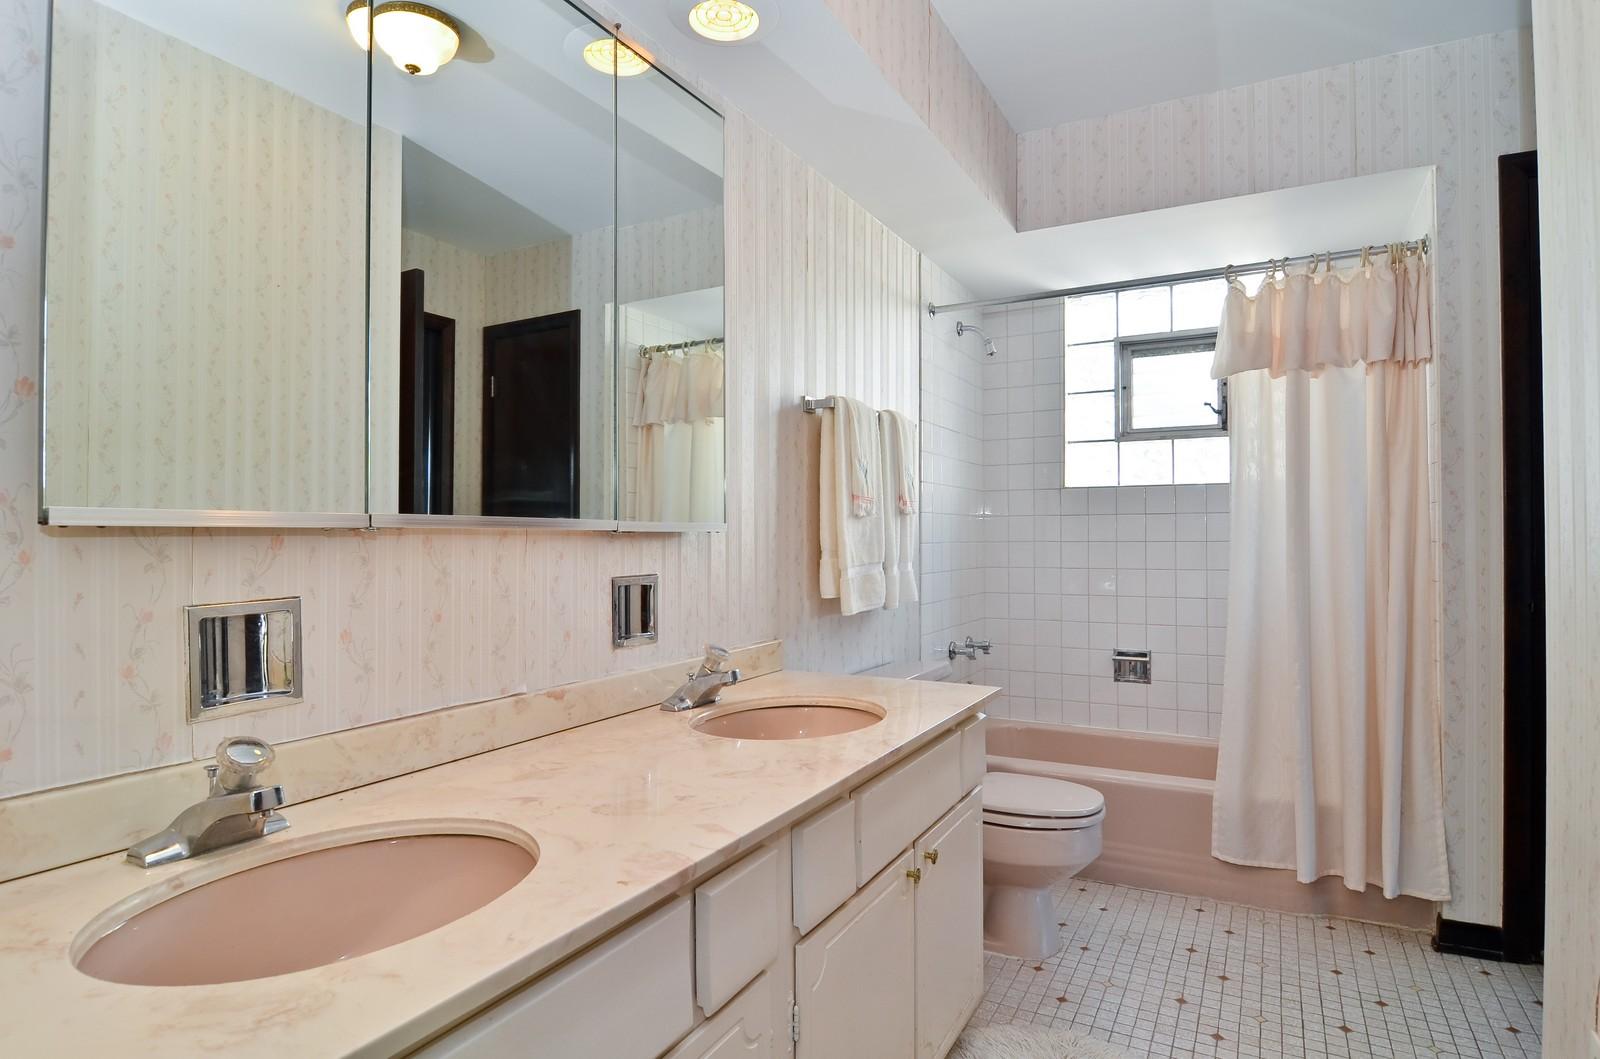 Real Estate Photography - 6959 N Dowagiac, Chicago, IL, 60646 - Bathroom